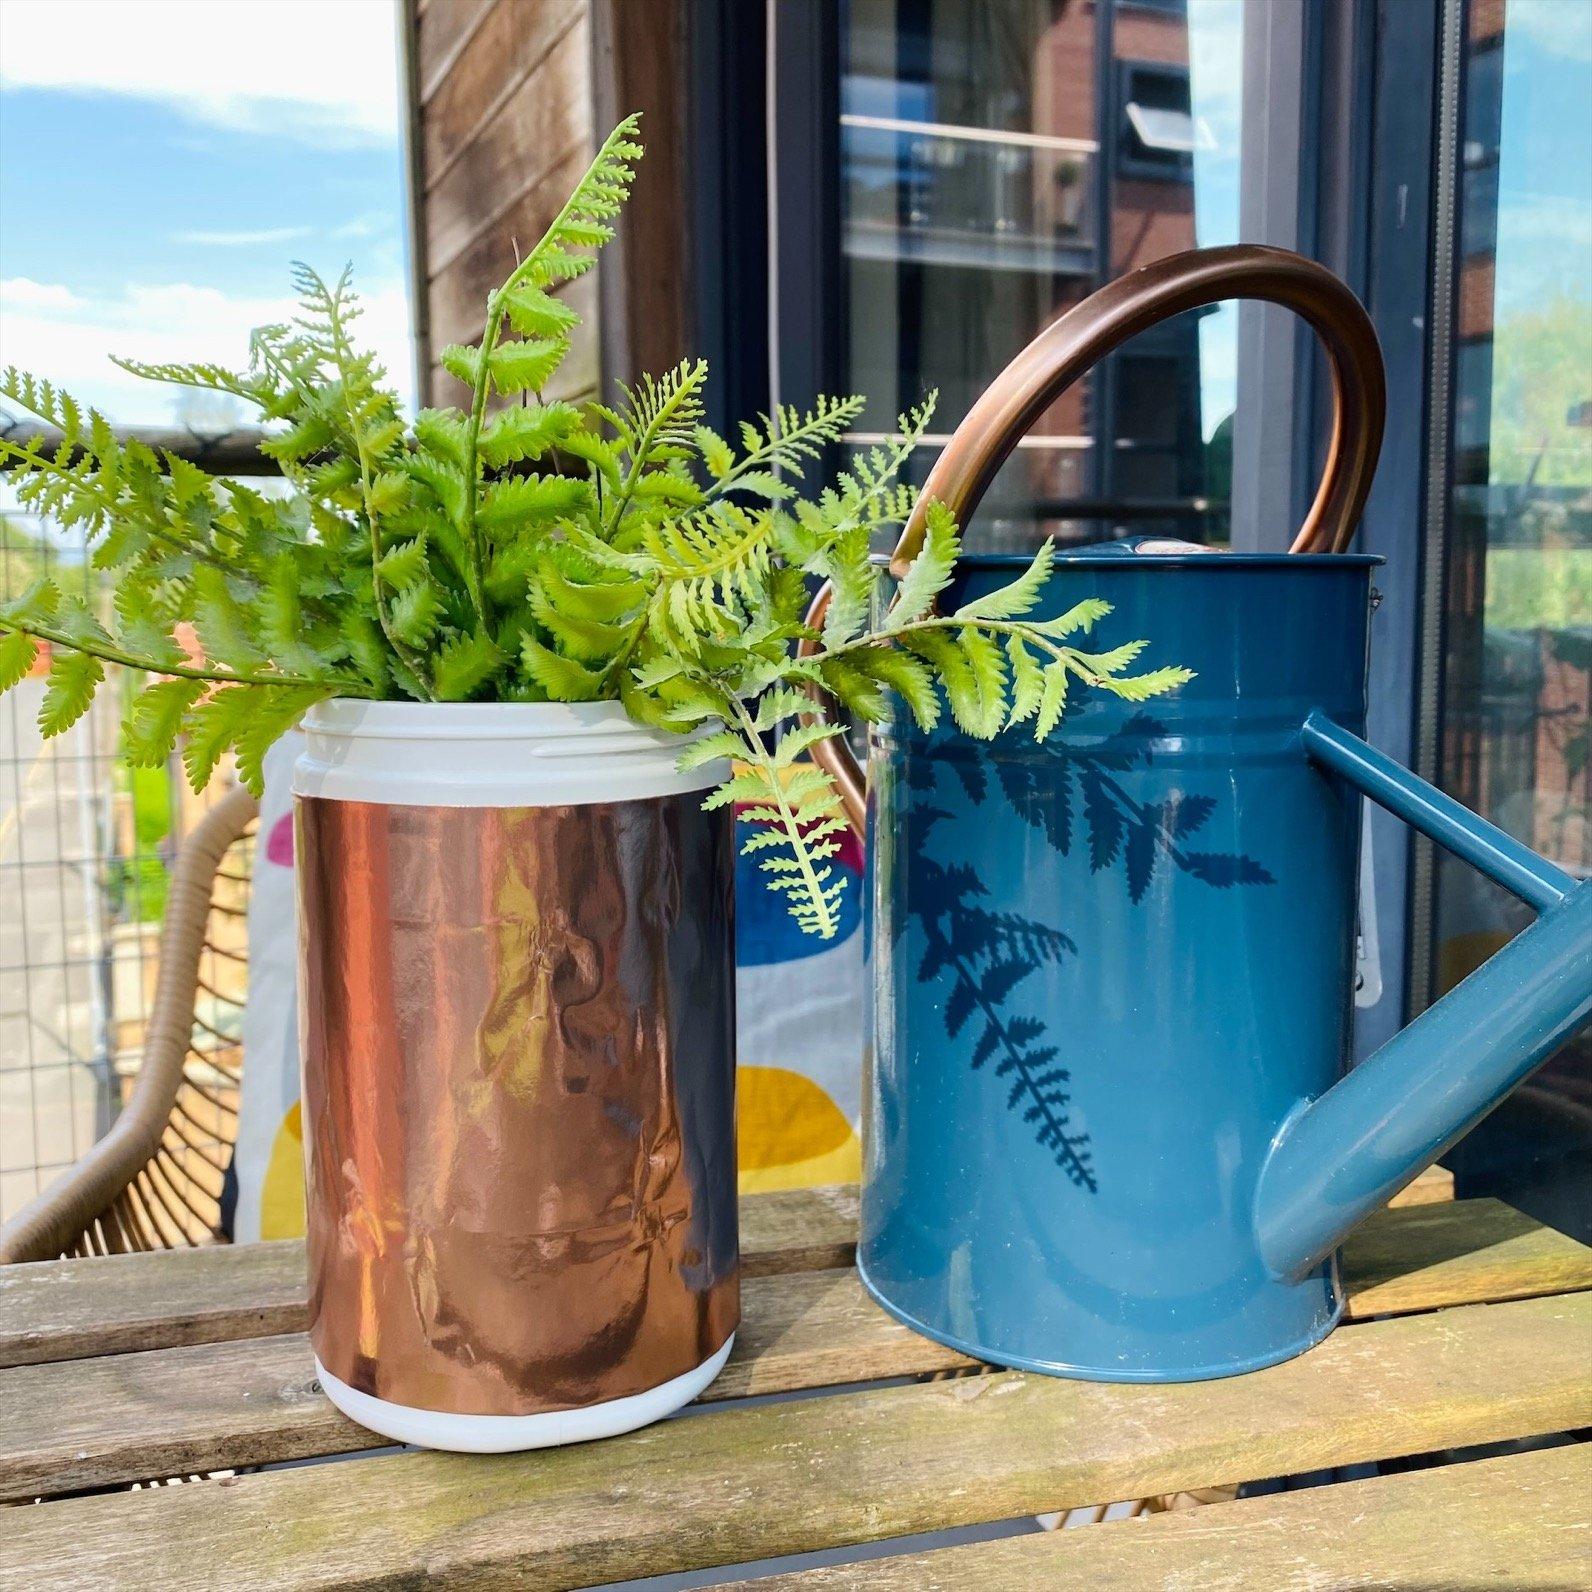 Reuse exante JUICED tub as plant pot